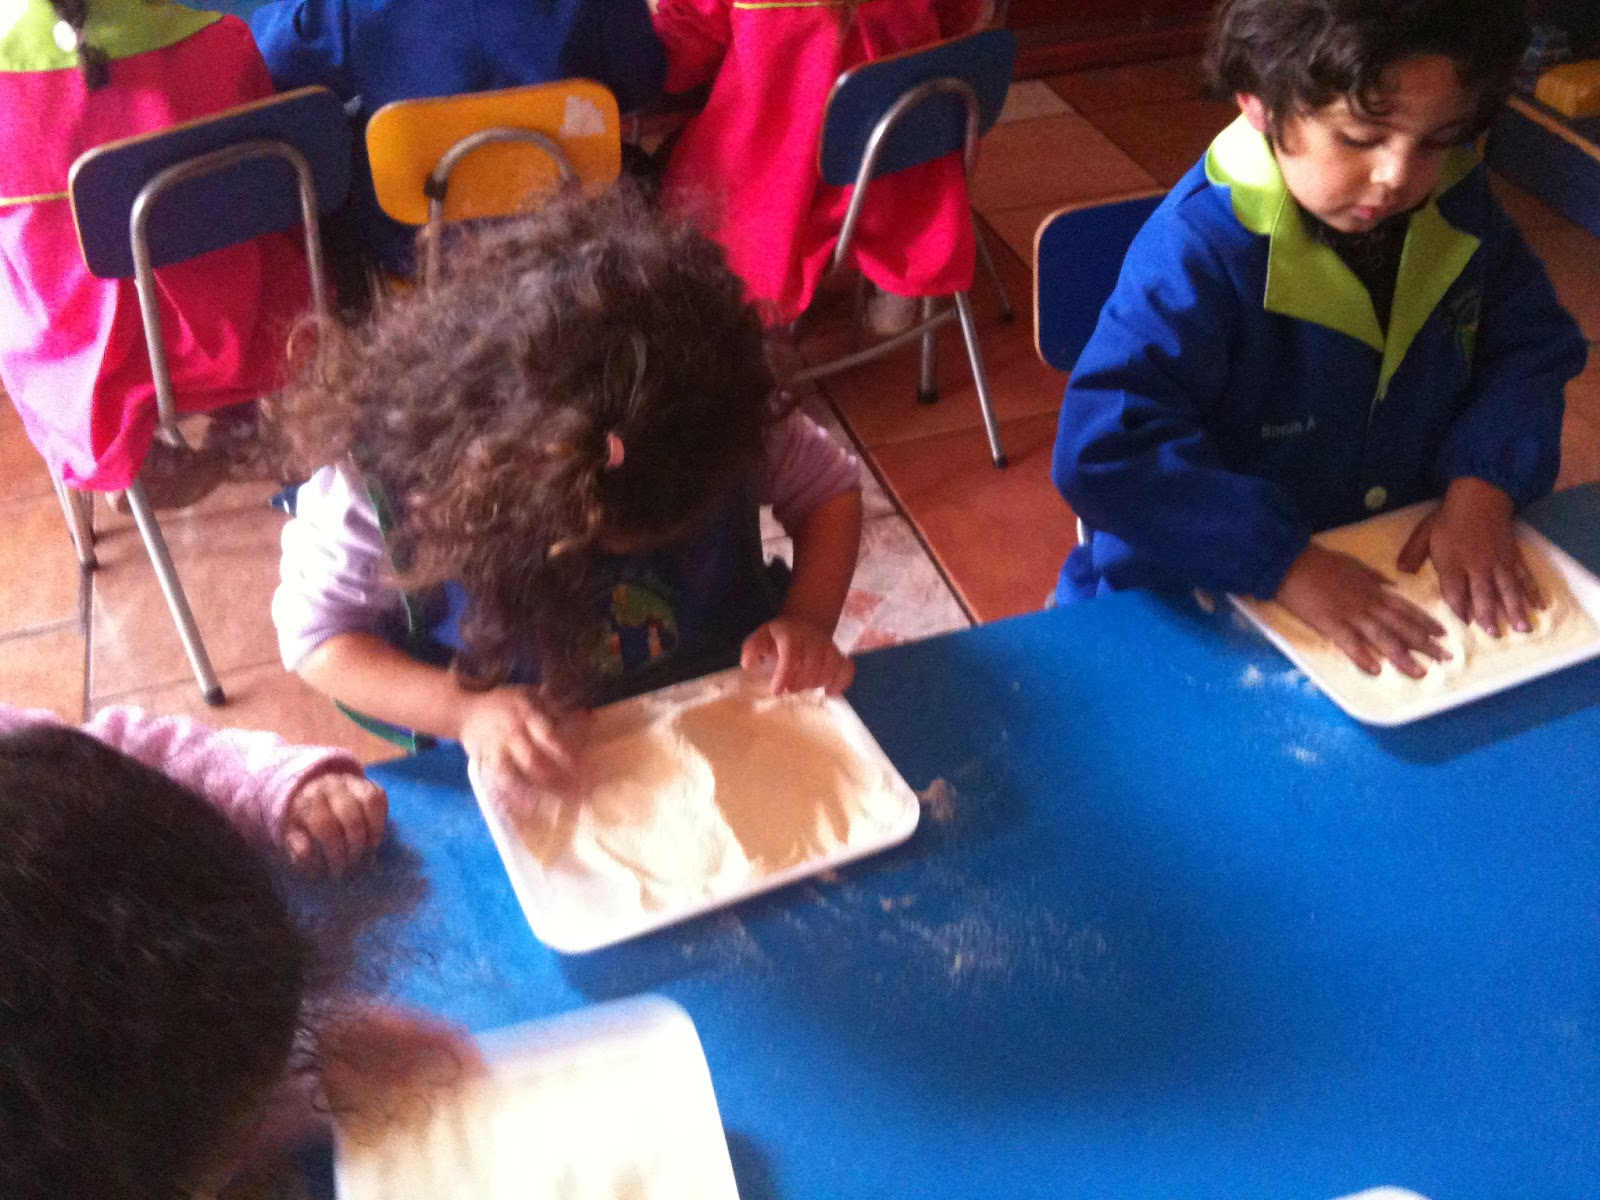 Jard n infantil un mundo de amor escribiendo en mesas for Jardin infantil serrano 78